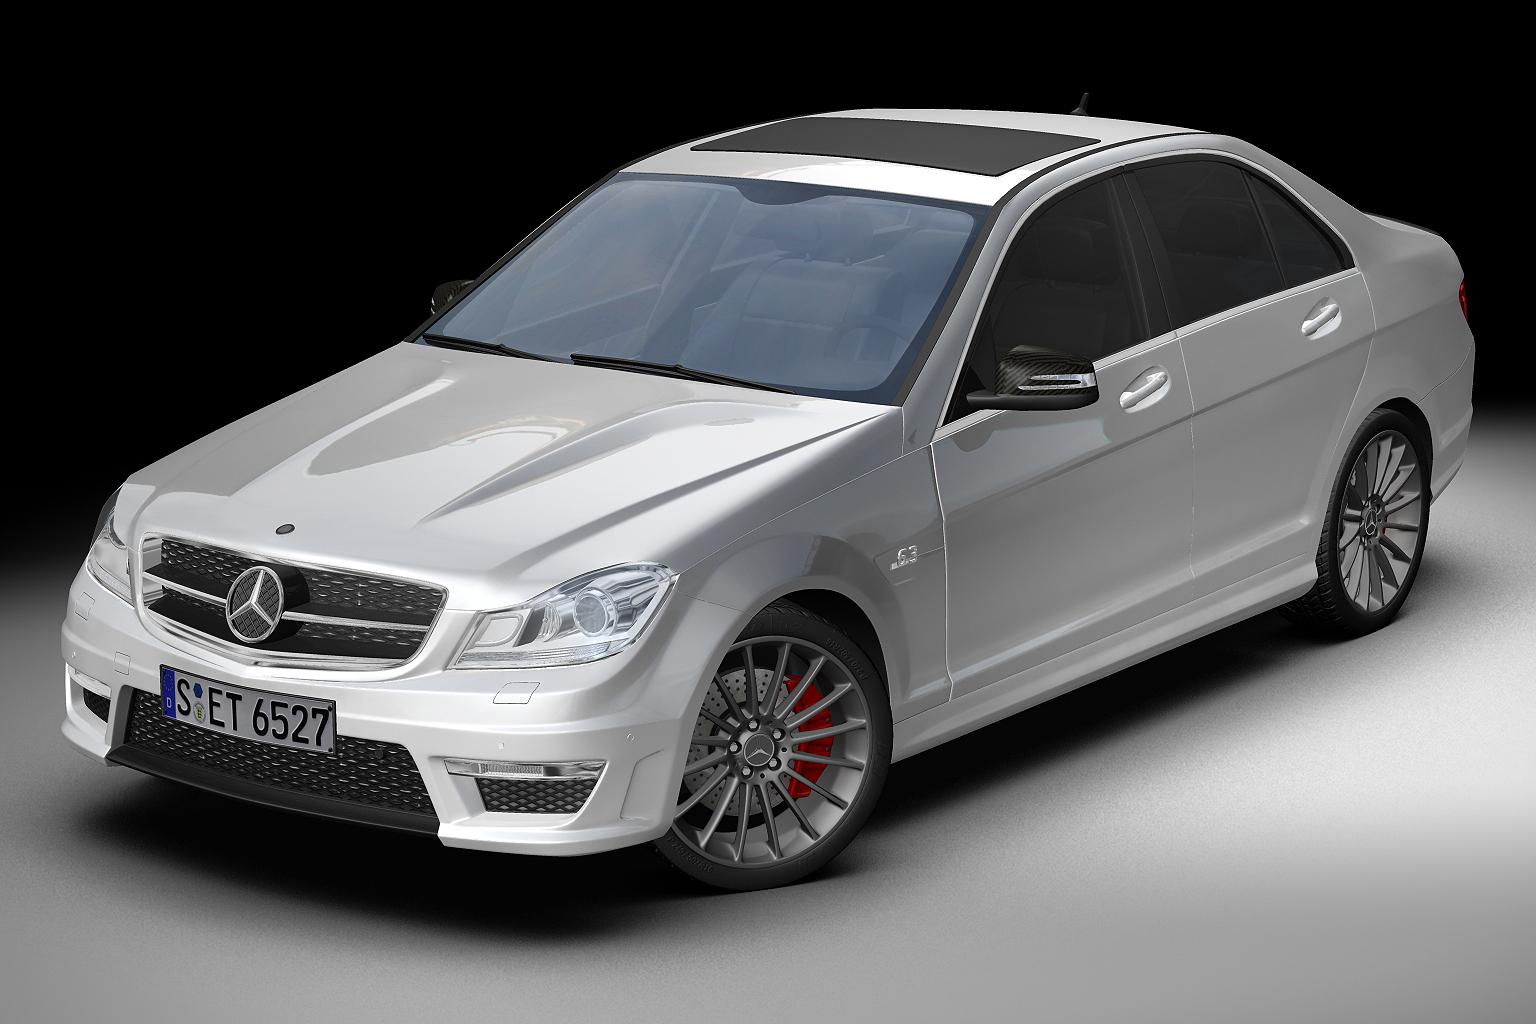 2012 mercedes benz c63 amg 3d модел 3ds макс fbx c4d lwo hrc xsi obj 136247